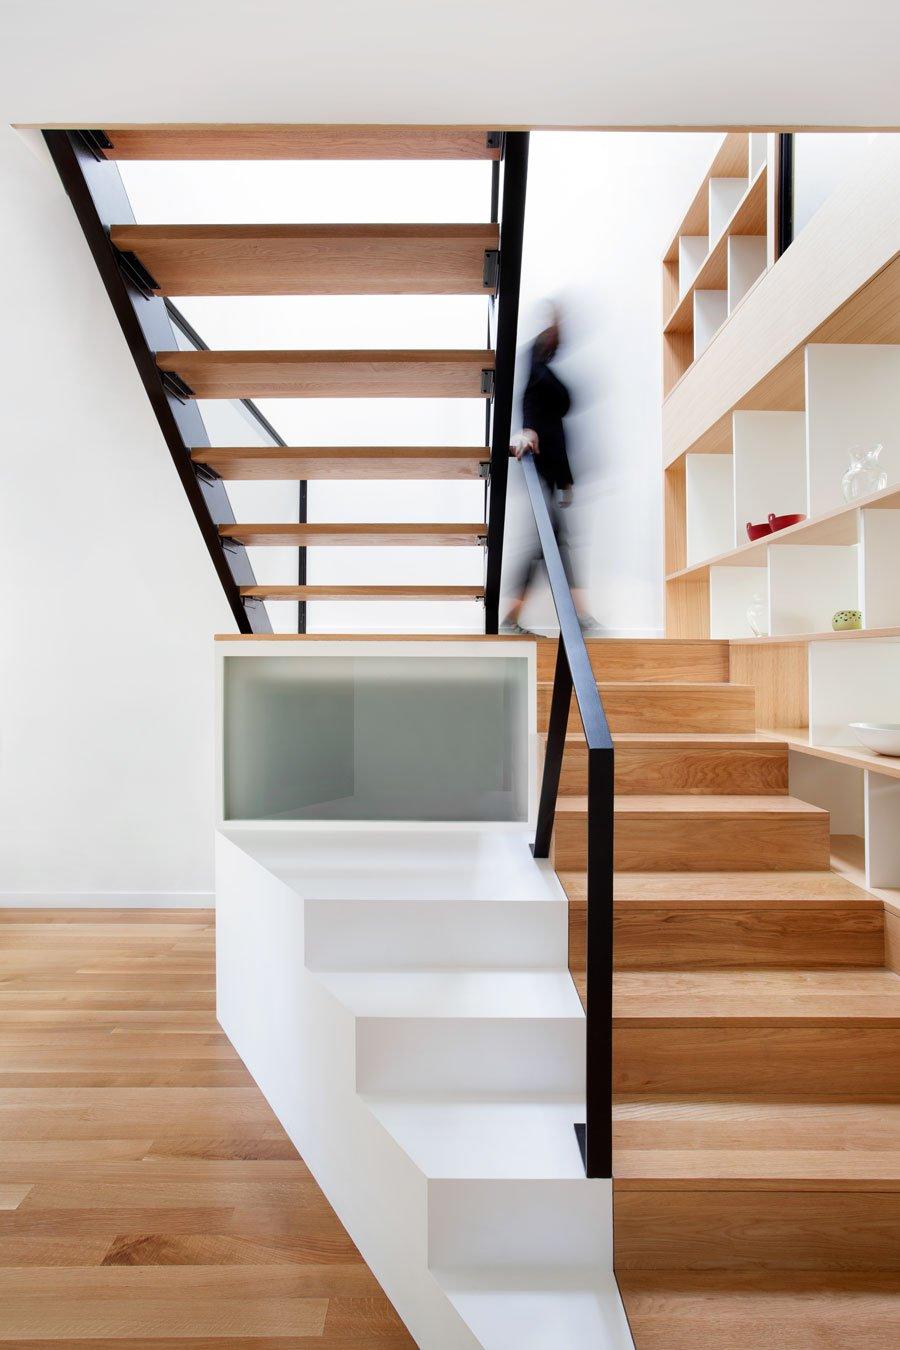 chambord residence by naturehumaine escalier contemporain bois et m tal. Black Bedroom Furniture Sets. Home Design Ideas